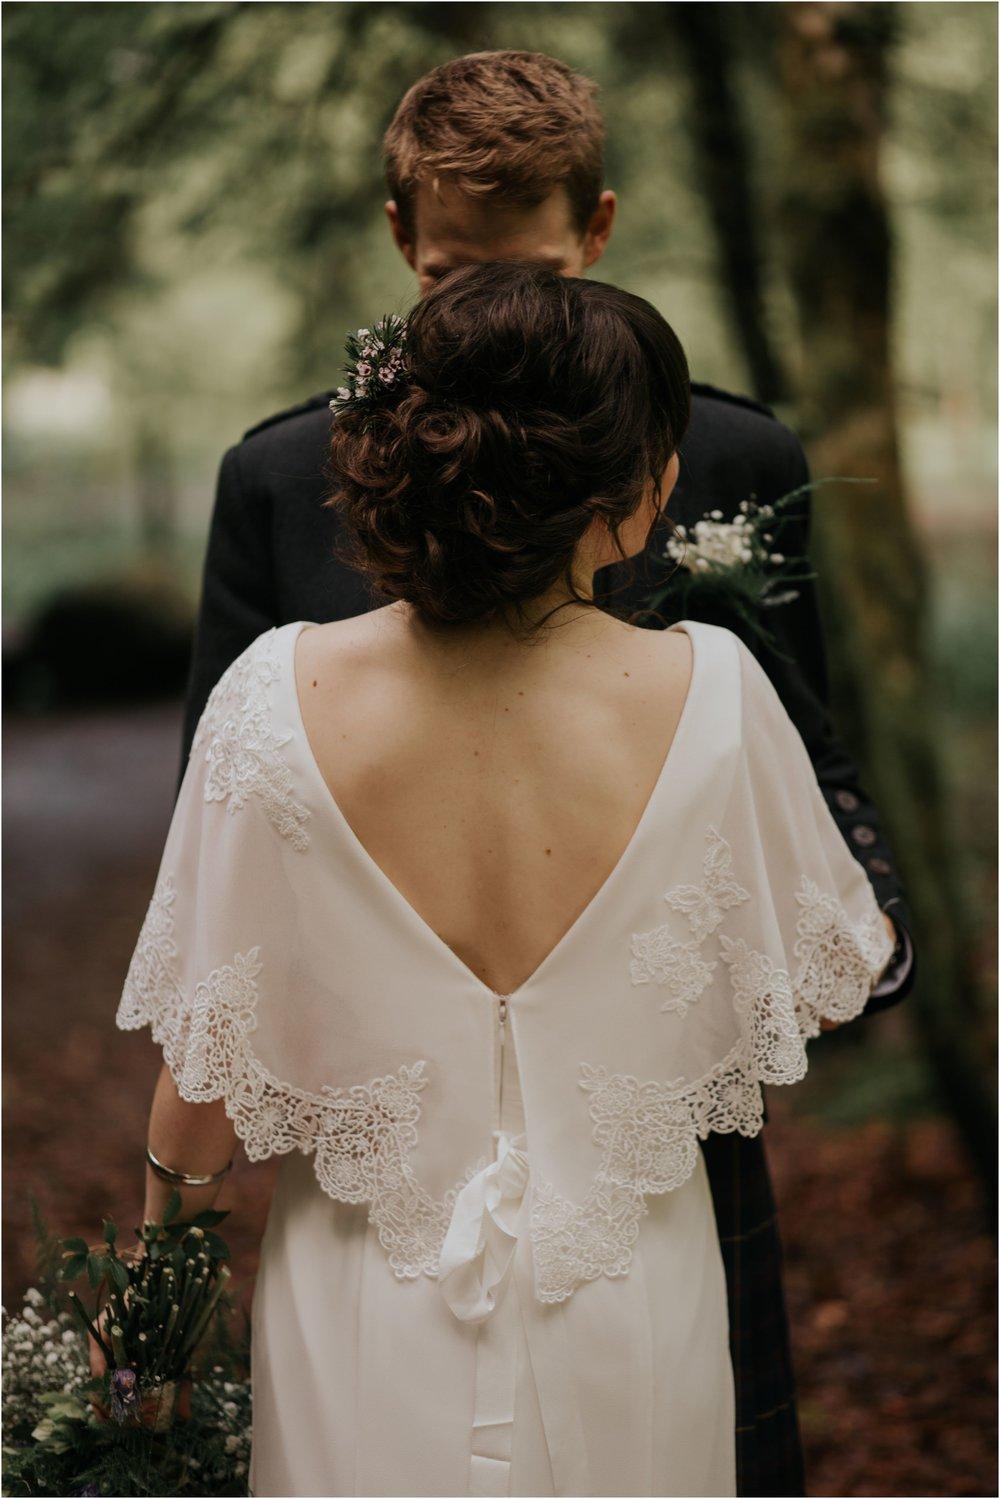 Photography 78 - Glasgow Wedding Photographer - Year in Reveiw_0057.jpg